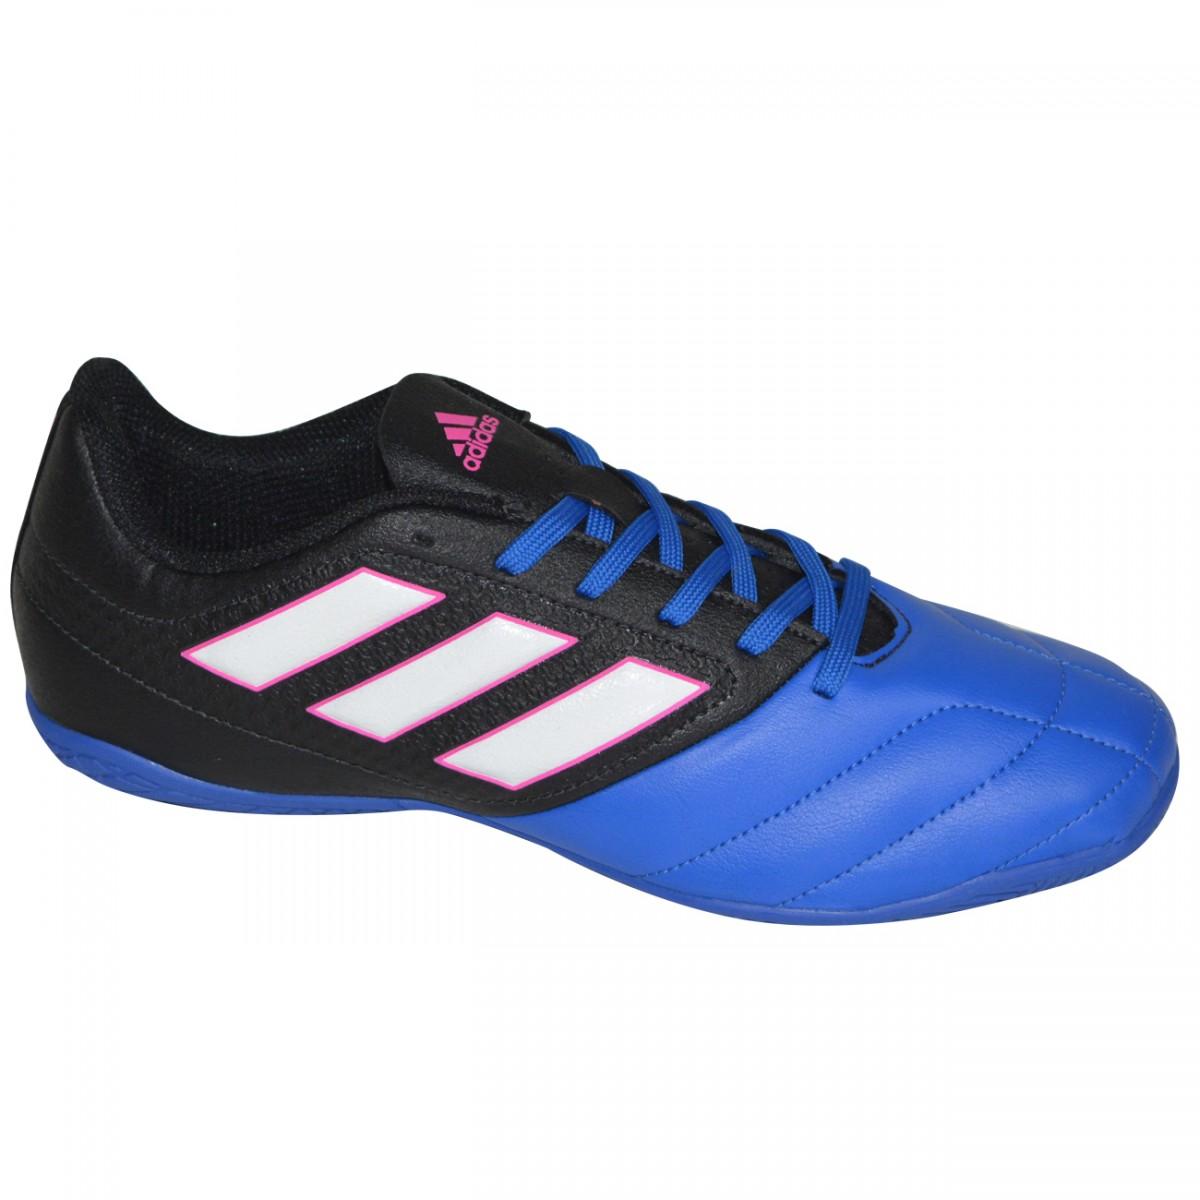 Tenis Adidas Ace 17.4 BB1767 - Preto Royal - Chuteira Nike 3071e5b7644f7